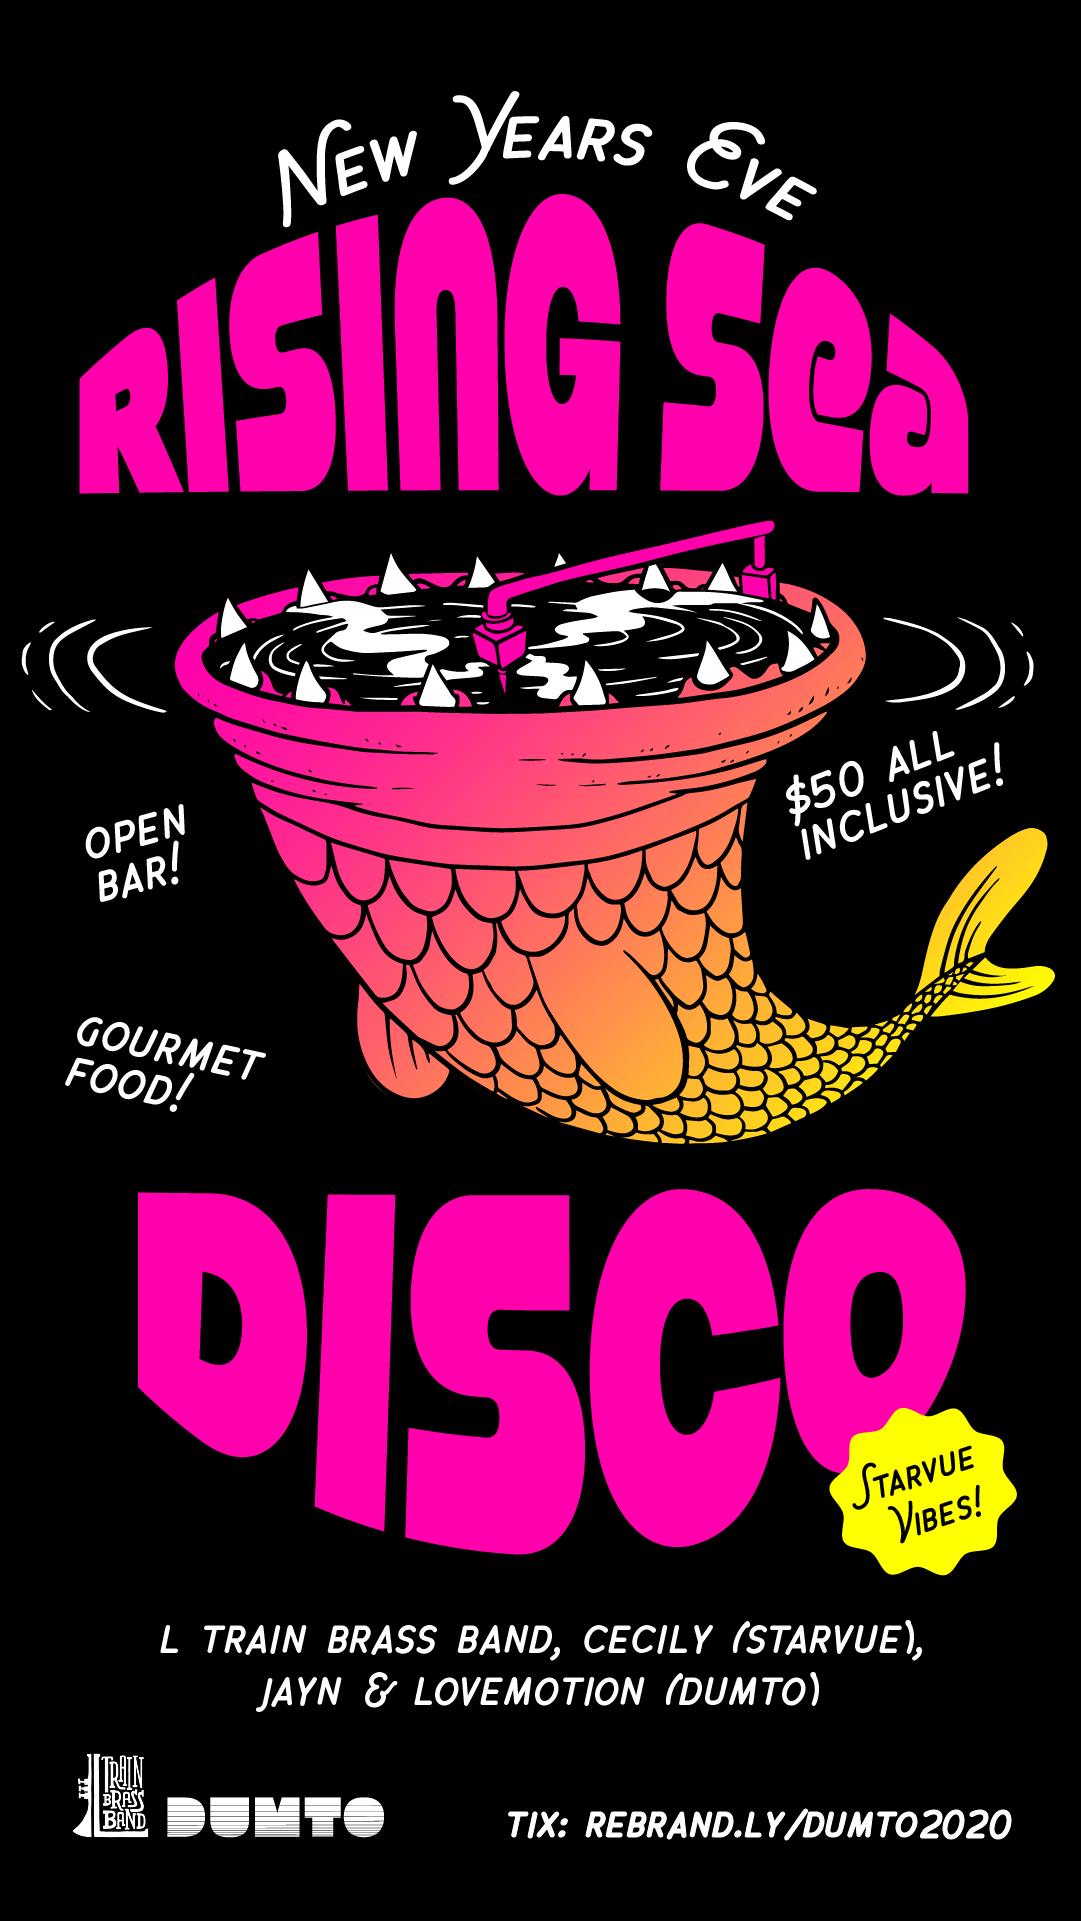 Dumto Rising sea disco NYE Open Bar Gourmet food Live Brass